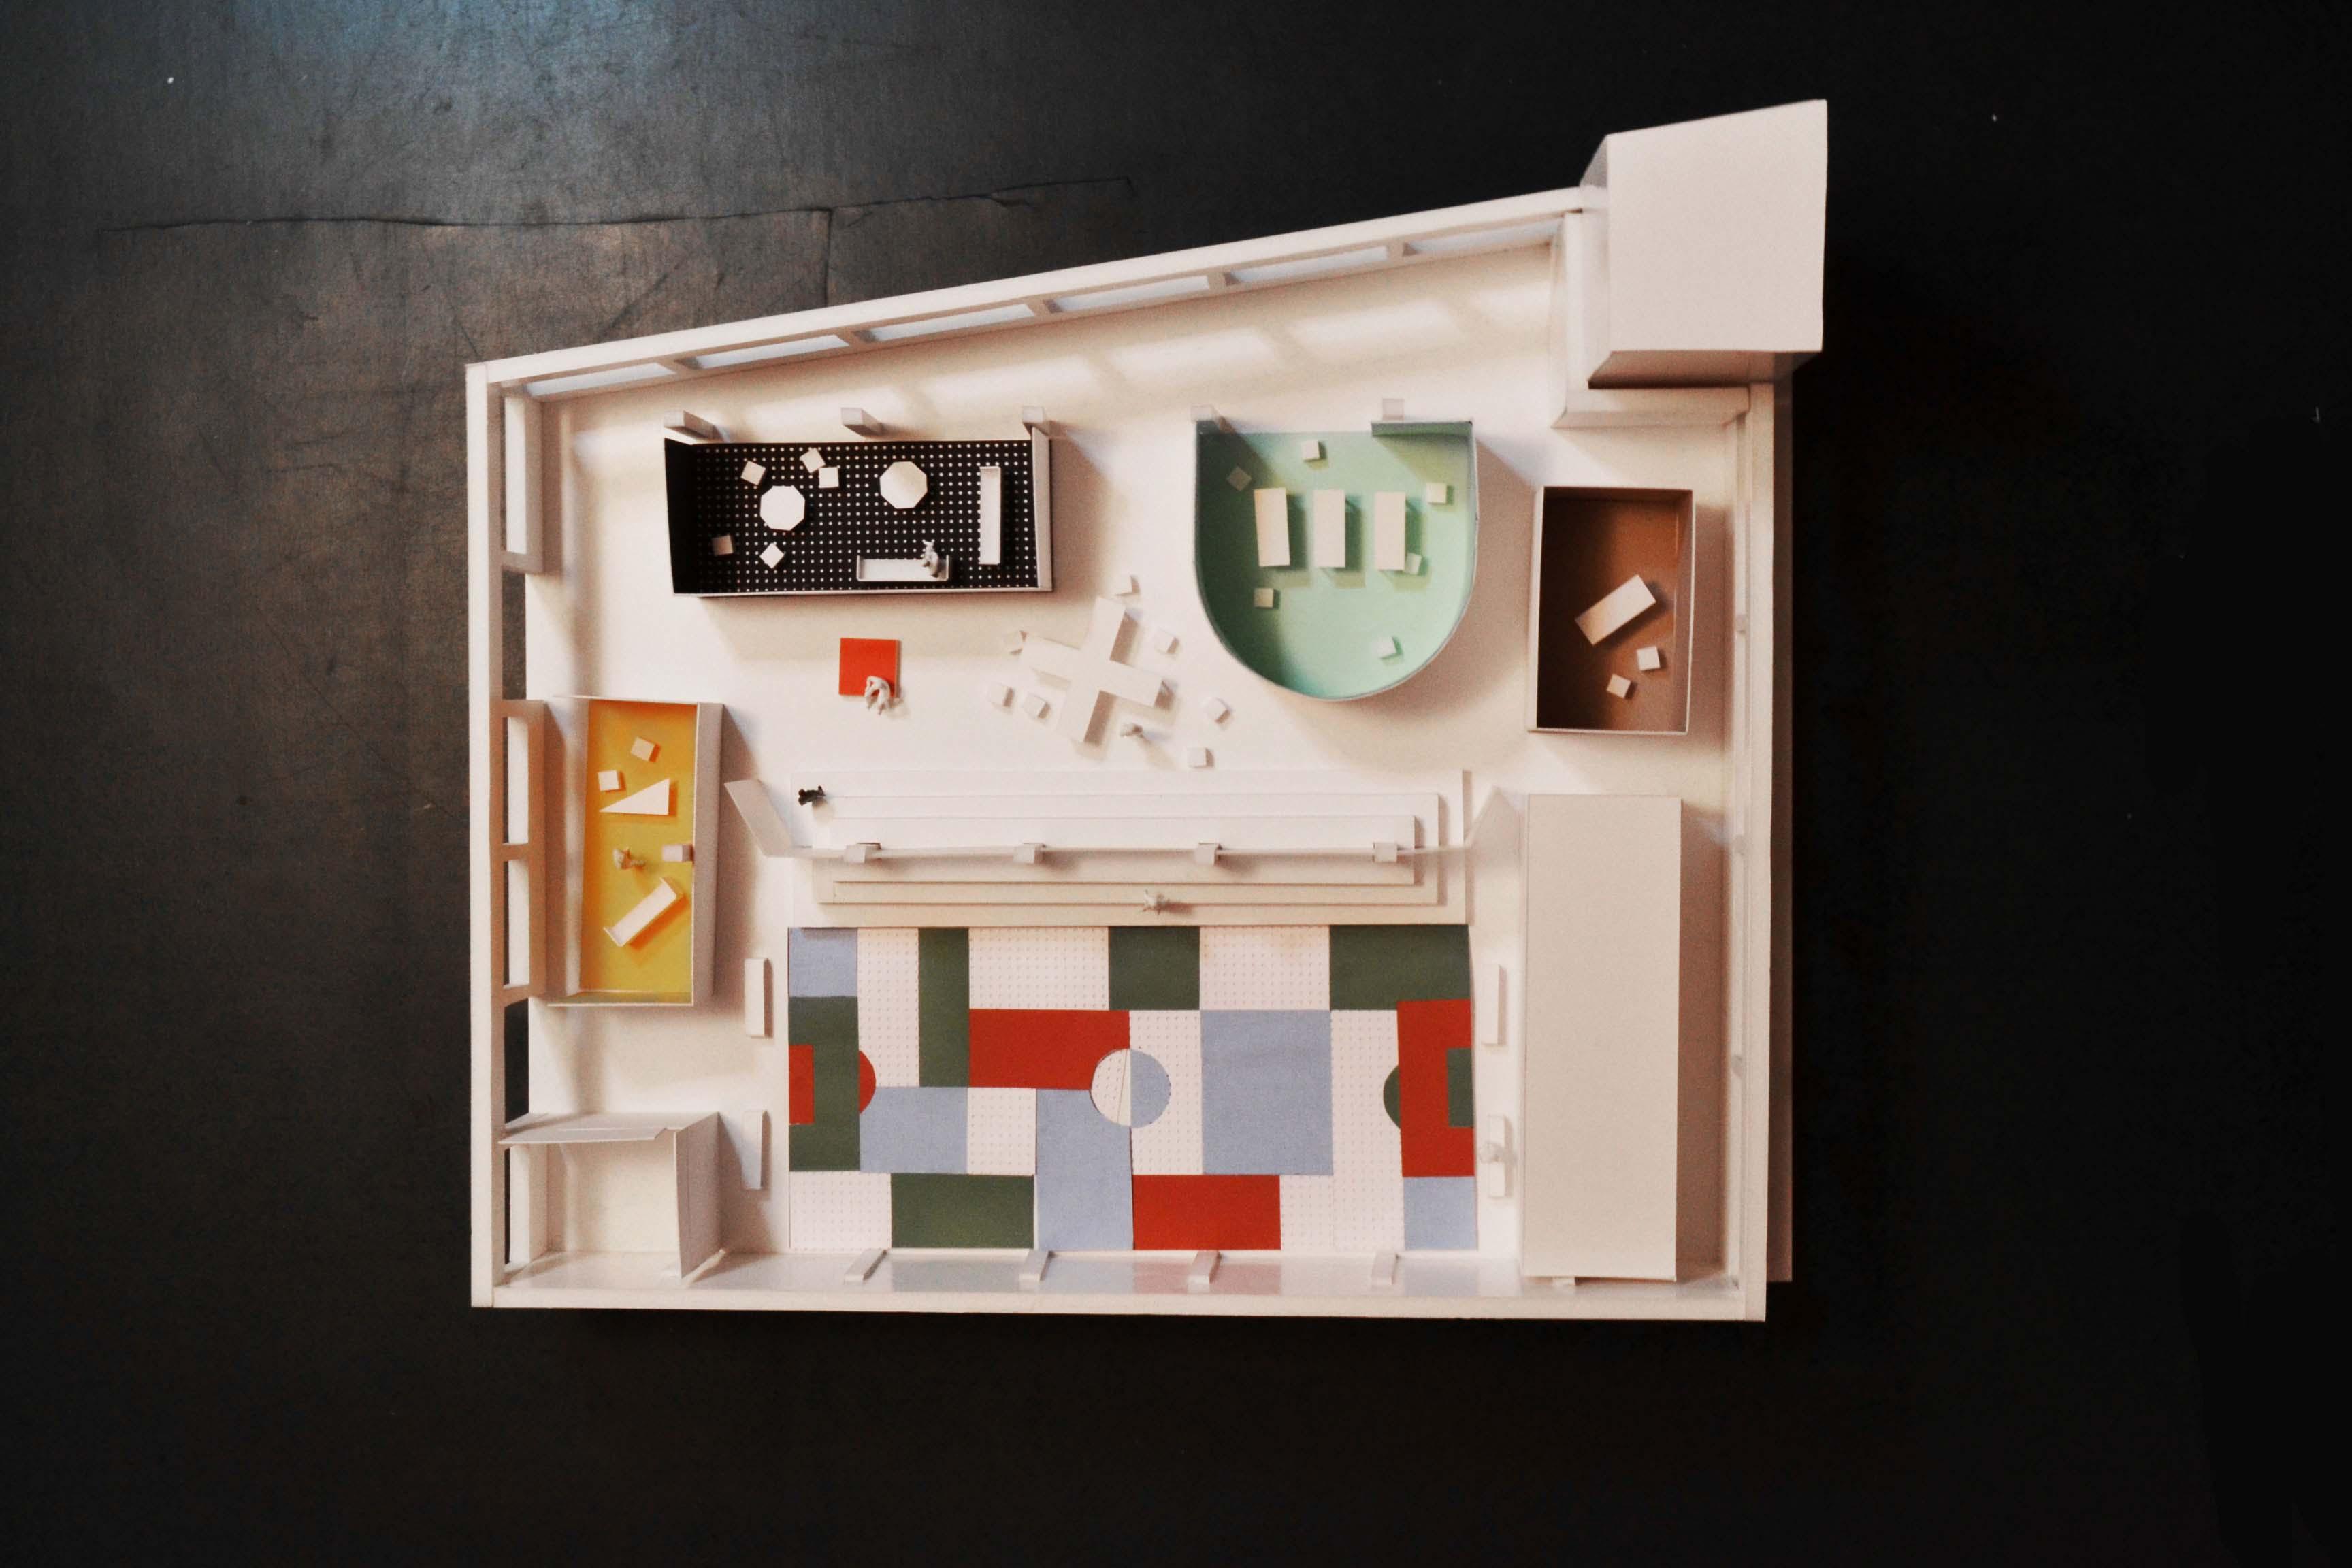 Argot ou La Maison Mobile